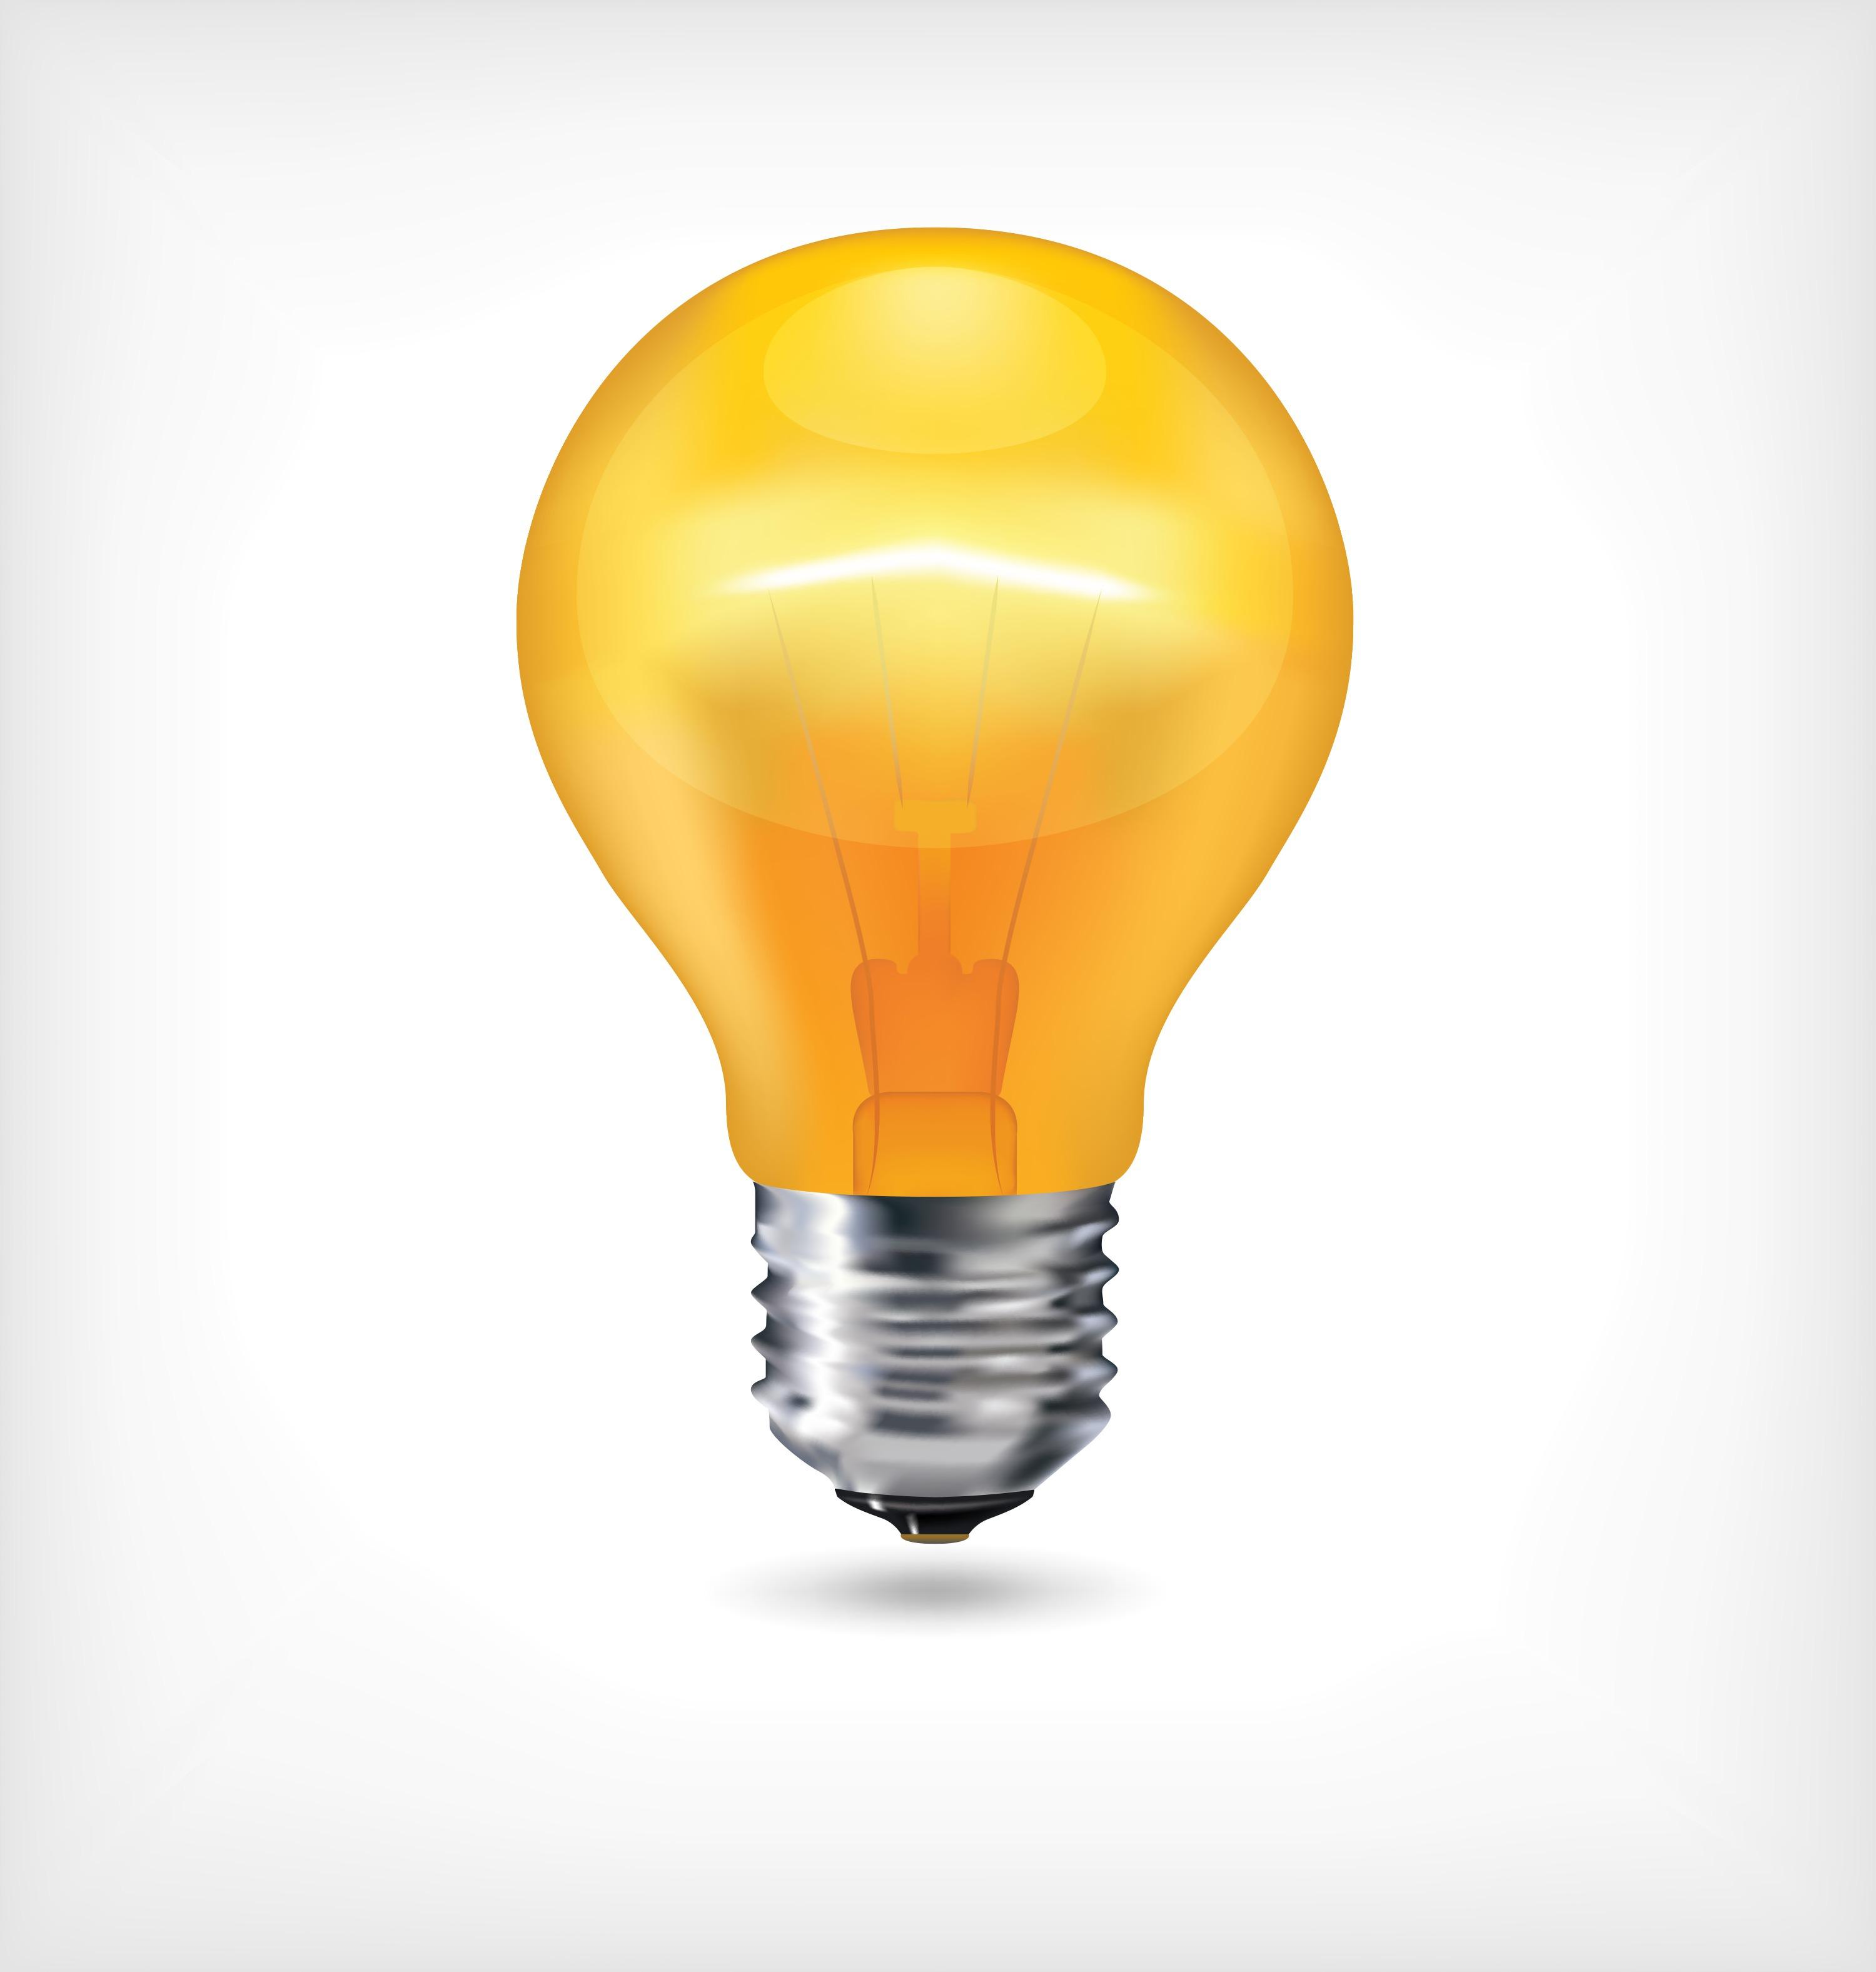 glossy-light-bulb-yellow-incandescent-realistic-light_f118A7_u_L